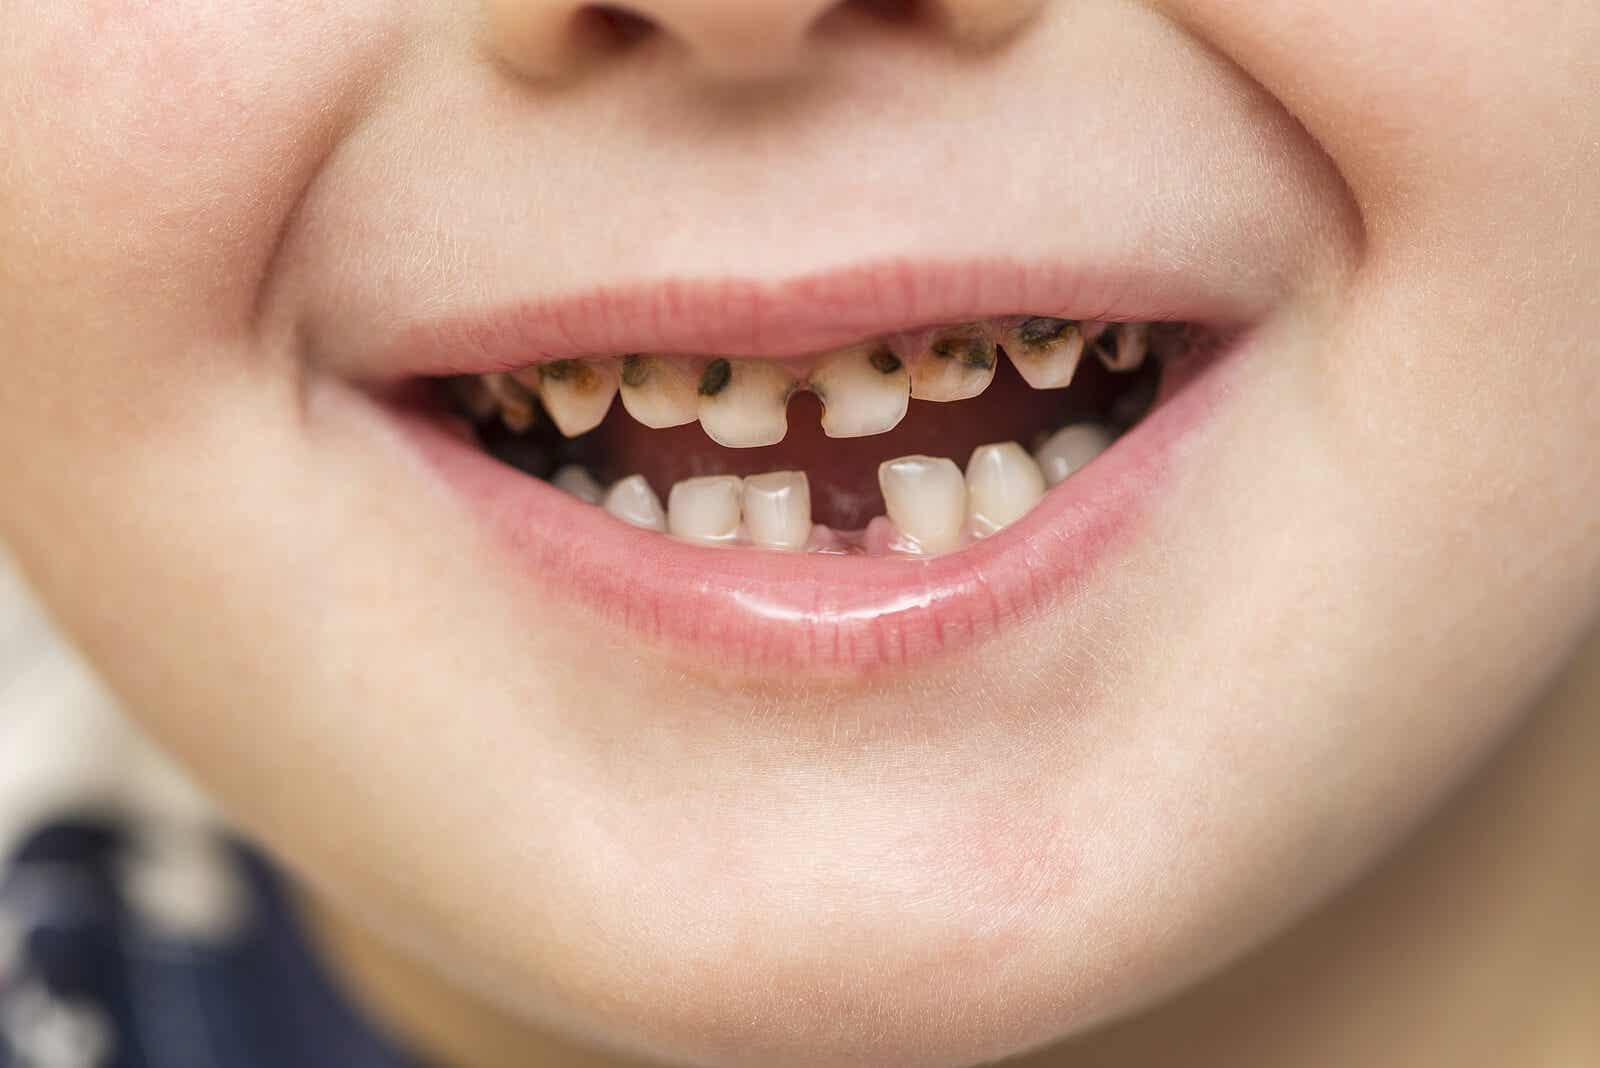 Boy with cavities.